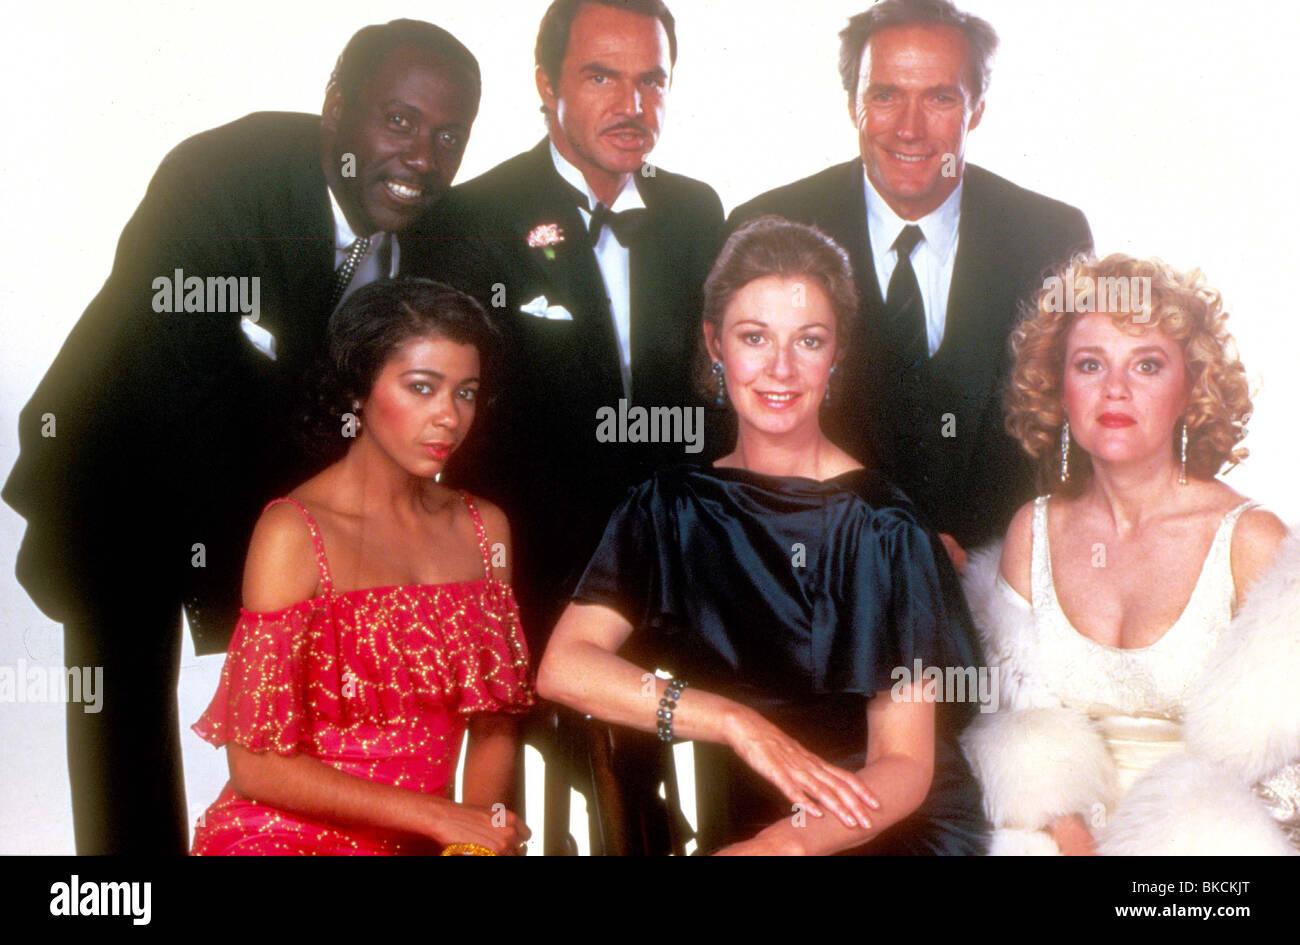 CITY HEAT (1984) RICHARD ROUNDTREE, IRENE CARA, BURT REYNOLDS, JANE ALEXANDER, CLINT EASTWOOD, MADELINE KAHN CIH - Stock Image